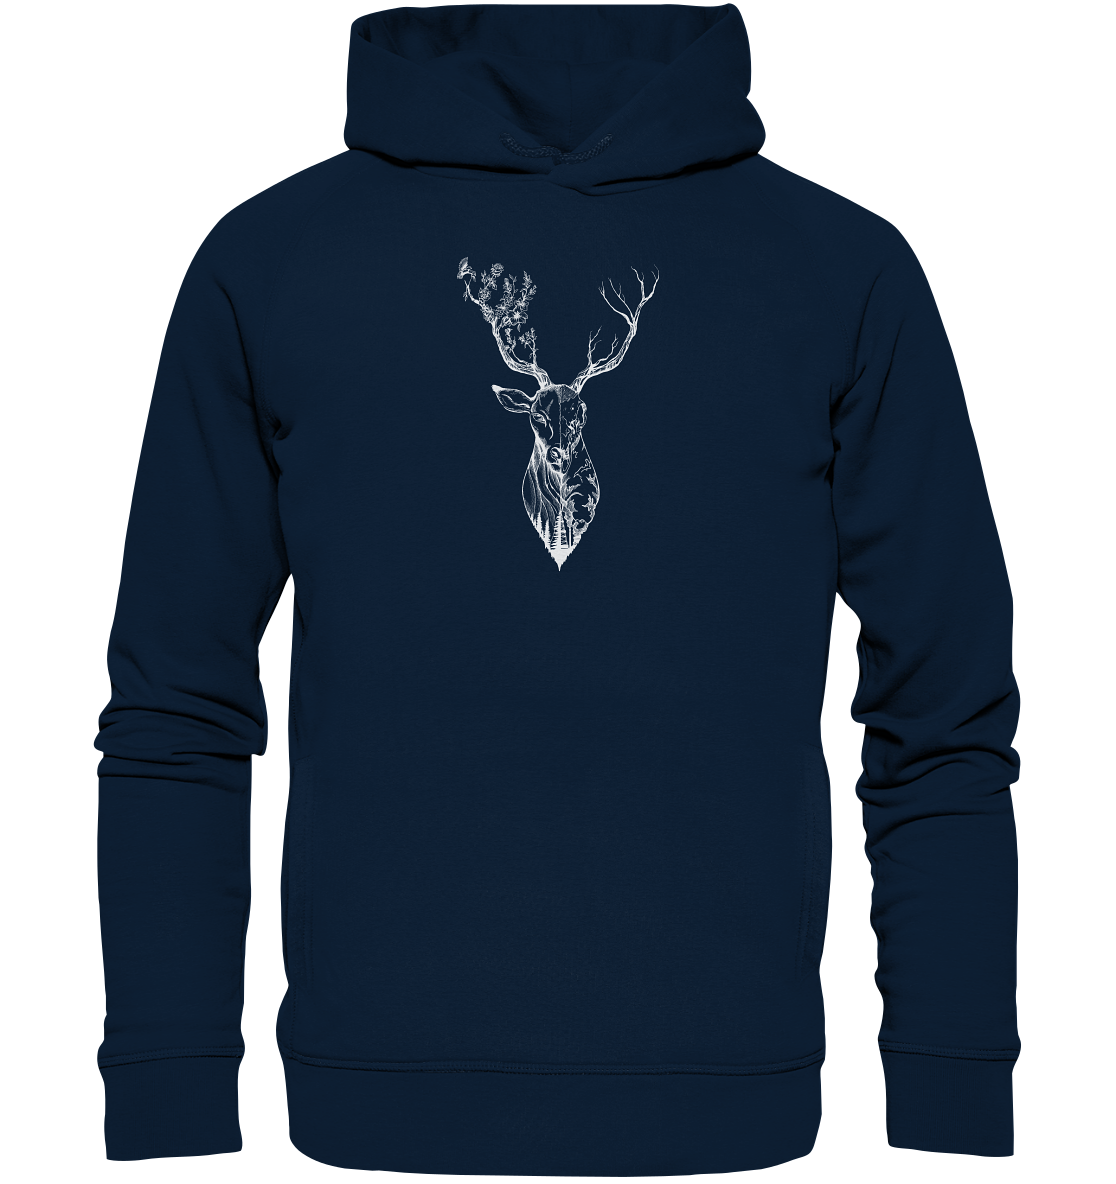 front-organic-fashion-hoodie-0e2035-1116x-7.png